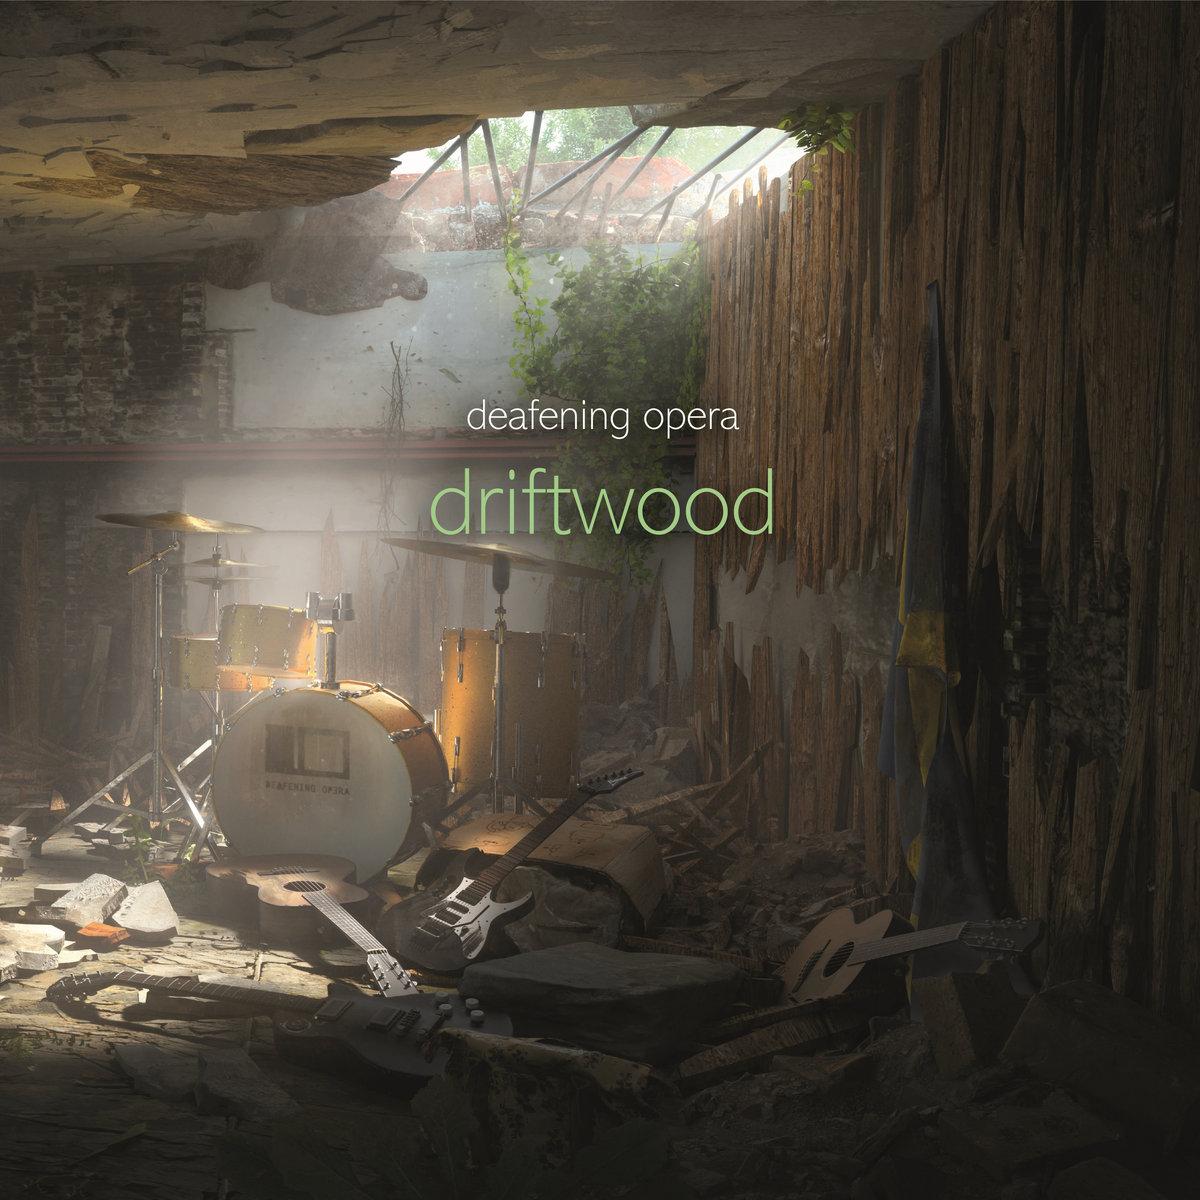 DeafeningOpera_Driftwood